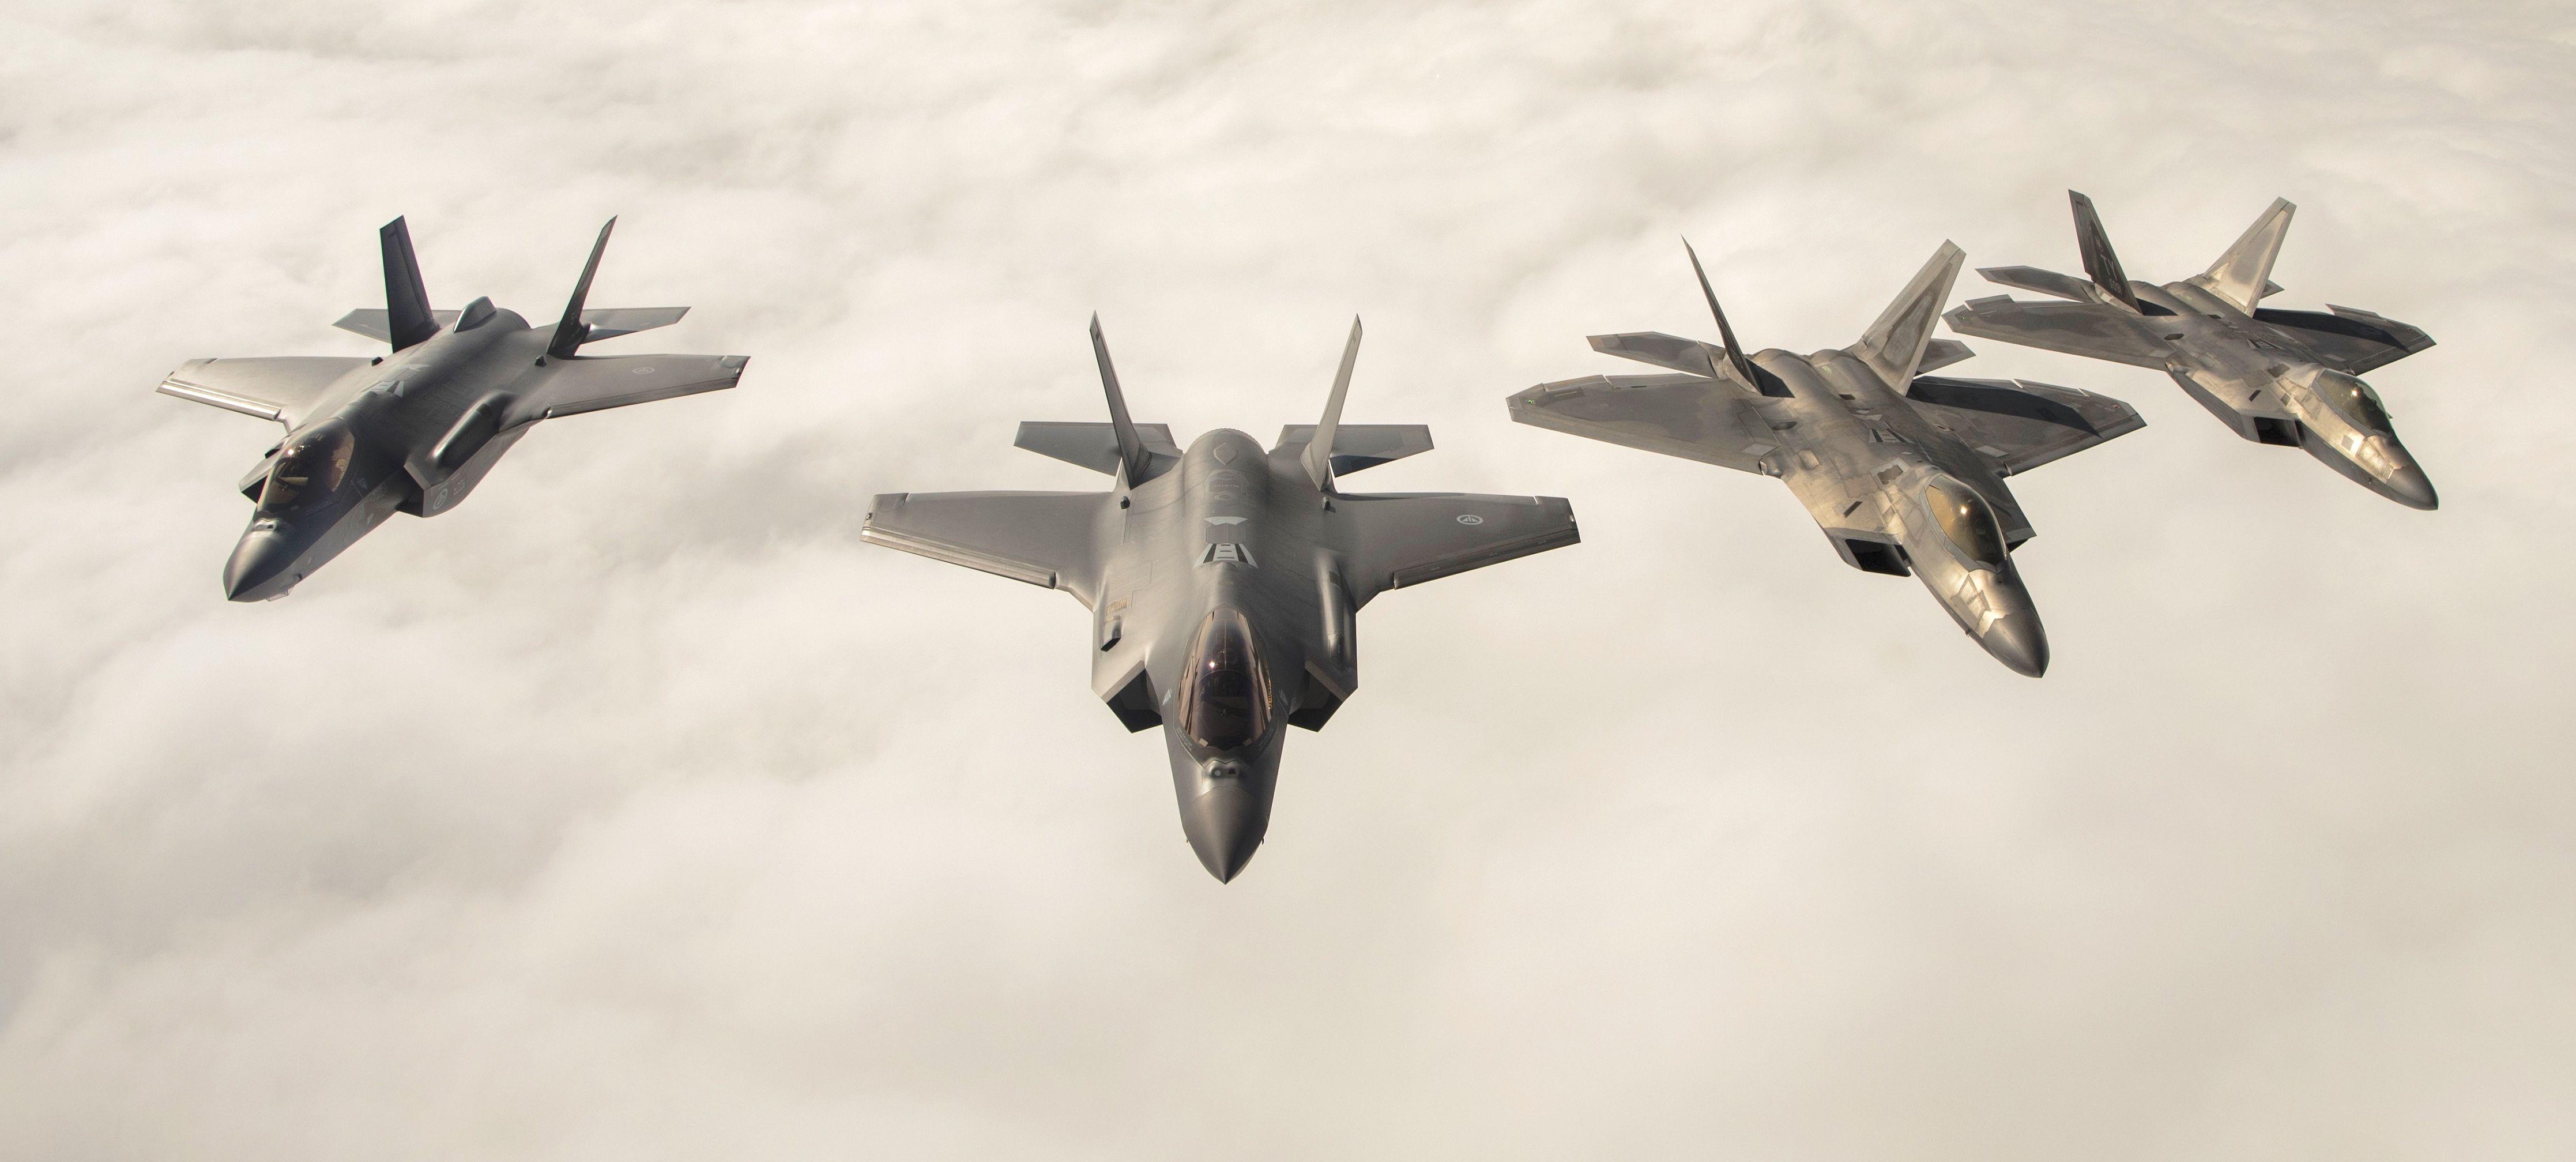 Fighterman_久丽美学研究的照片 微相册 Military Aircraft Norwegian